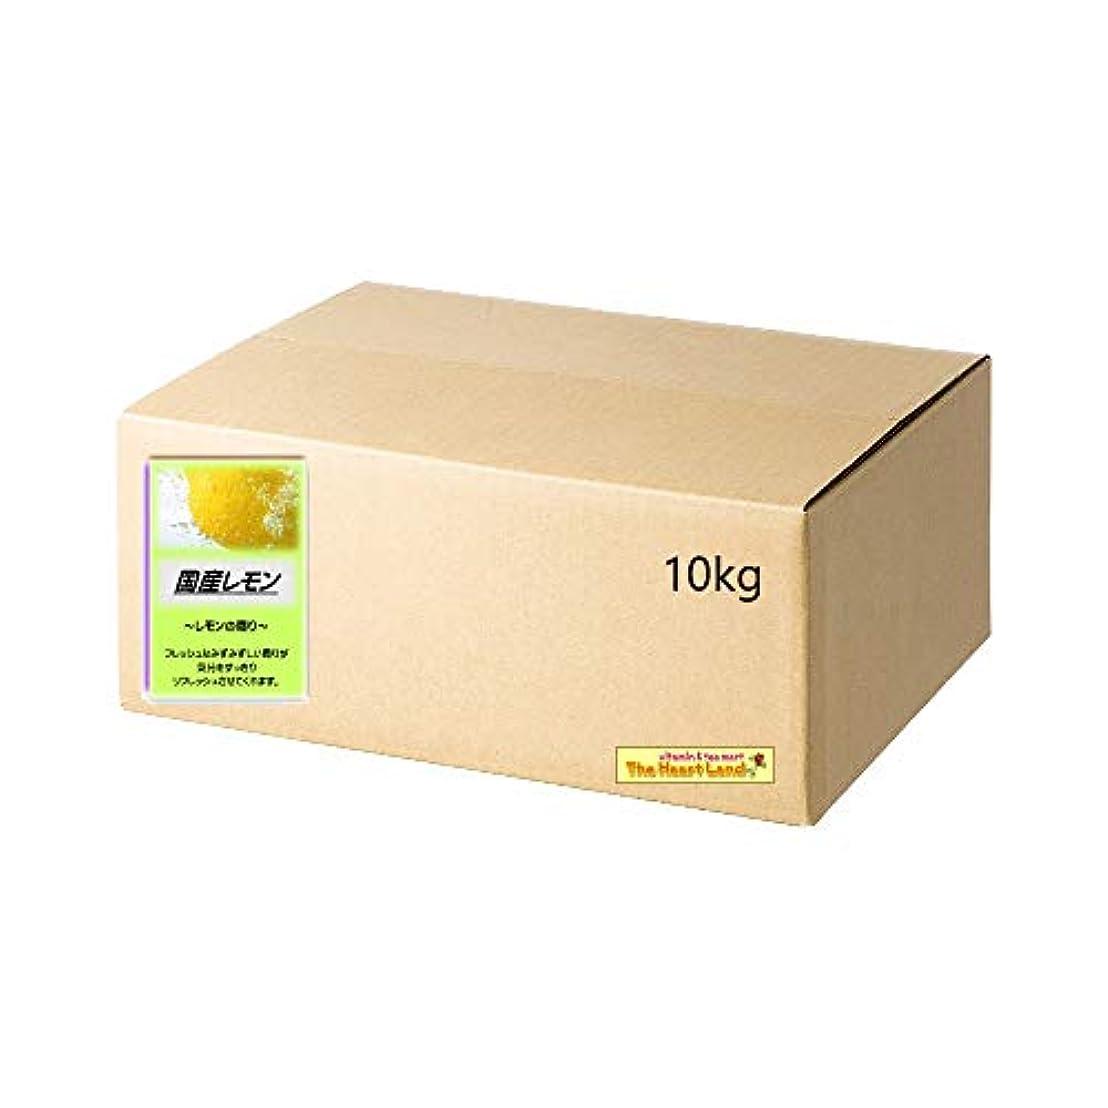 材料疑い者三角形アサヒ入浴剤 浴用入浴化粧品 国産レモン 10kg